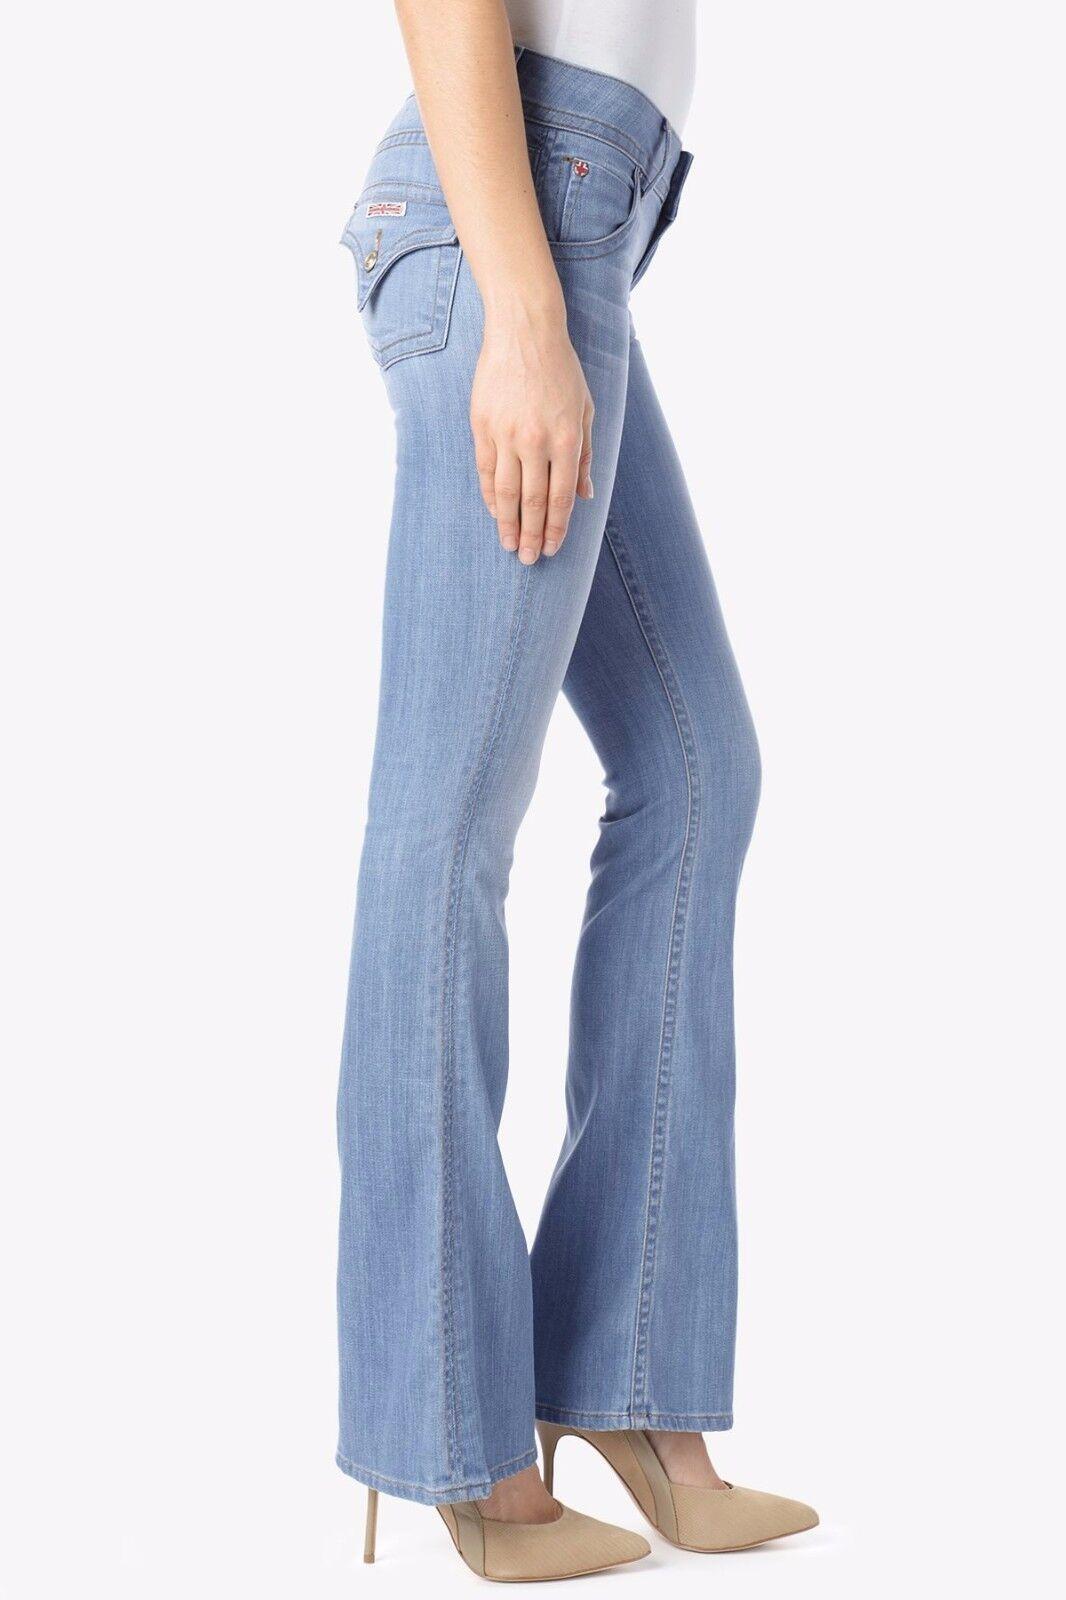 NWT HUDSON I'VE GOT SOUL Signature Bootcut Mid-Rise Jeans 27 BRAND NEW WM170DHA